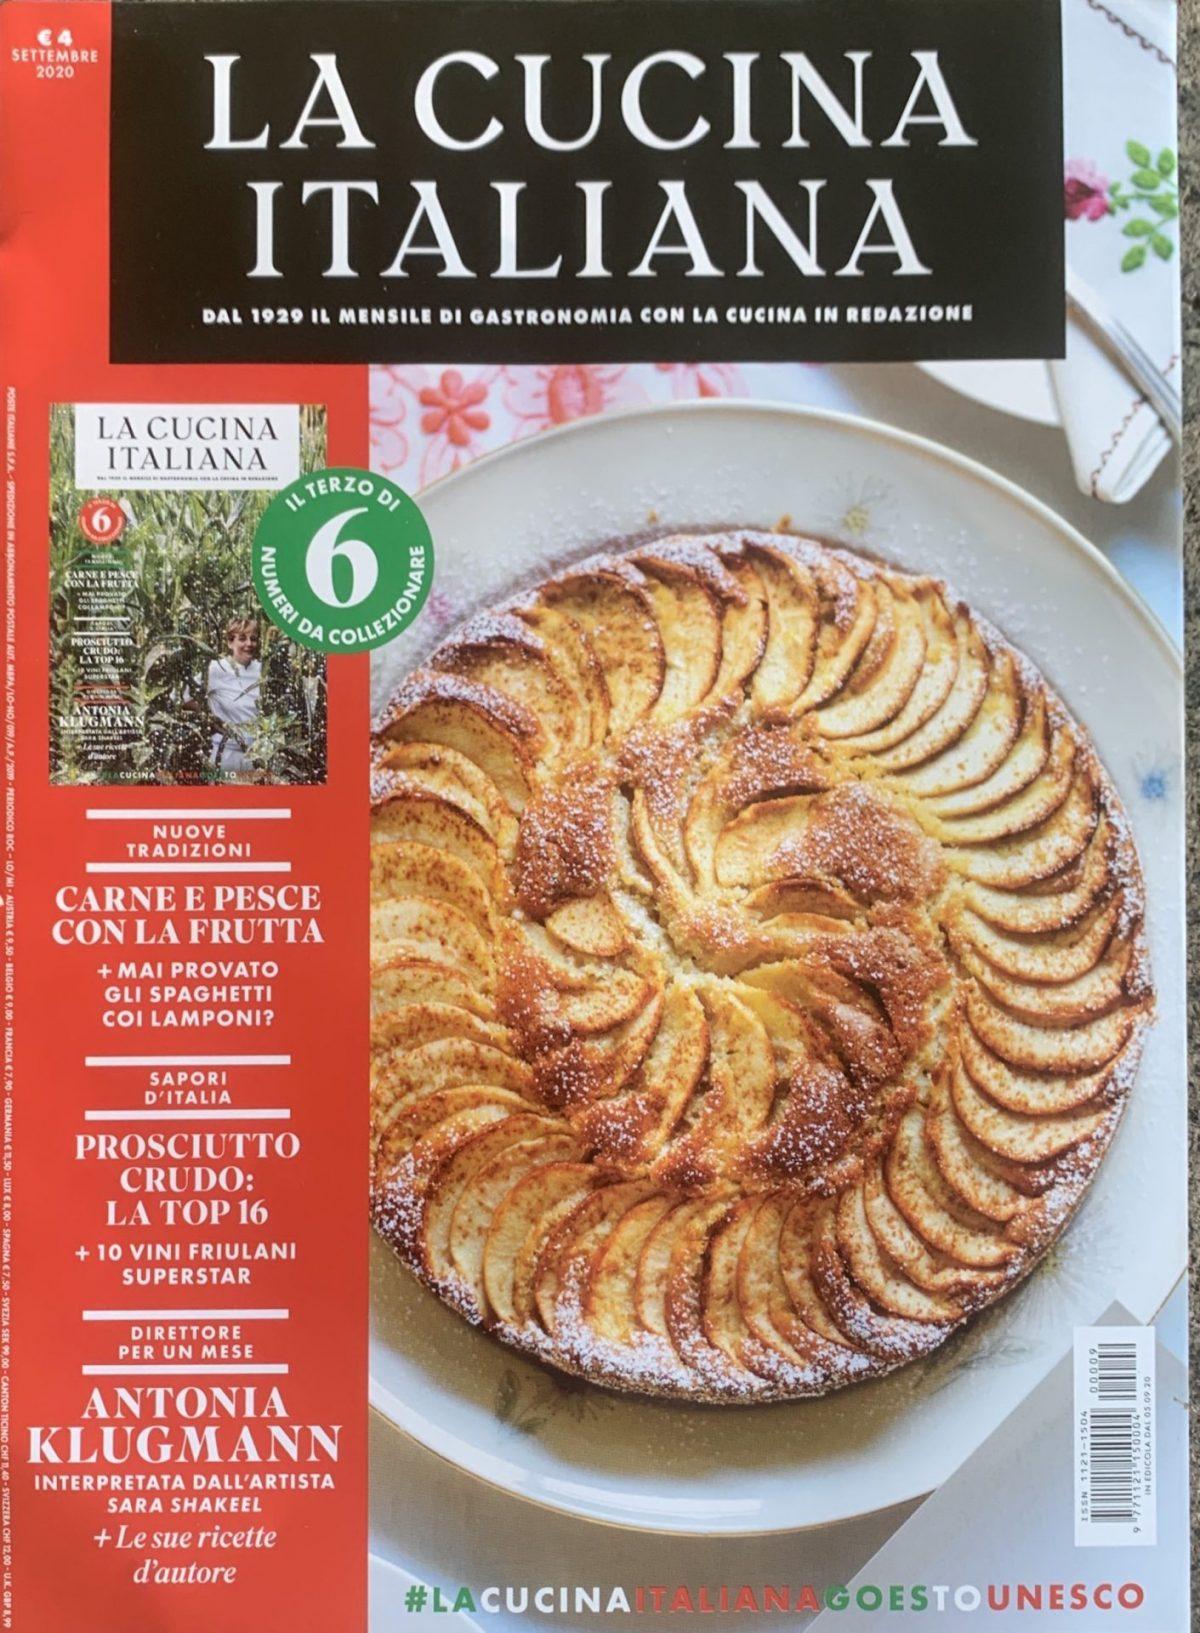 La Cucina Italiana: 5 SOSTE APPETITOSE